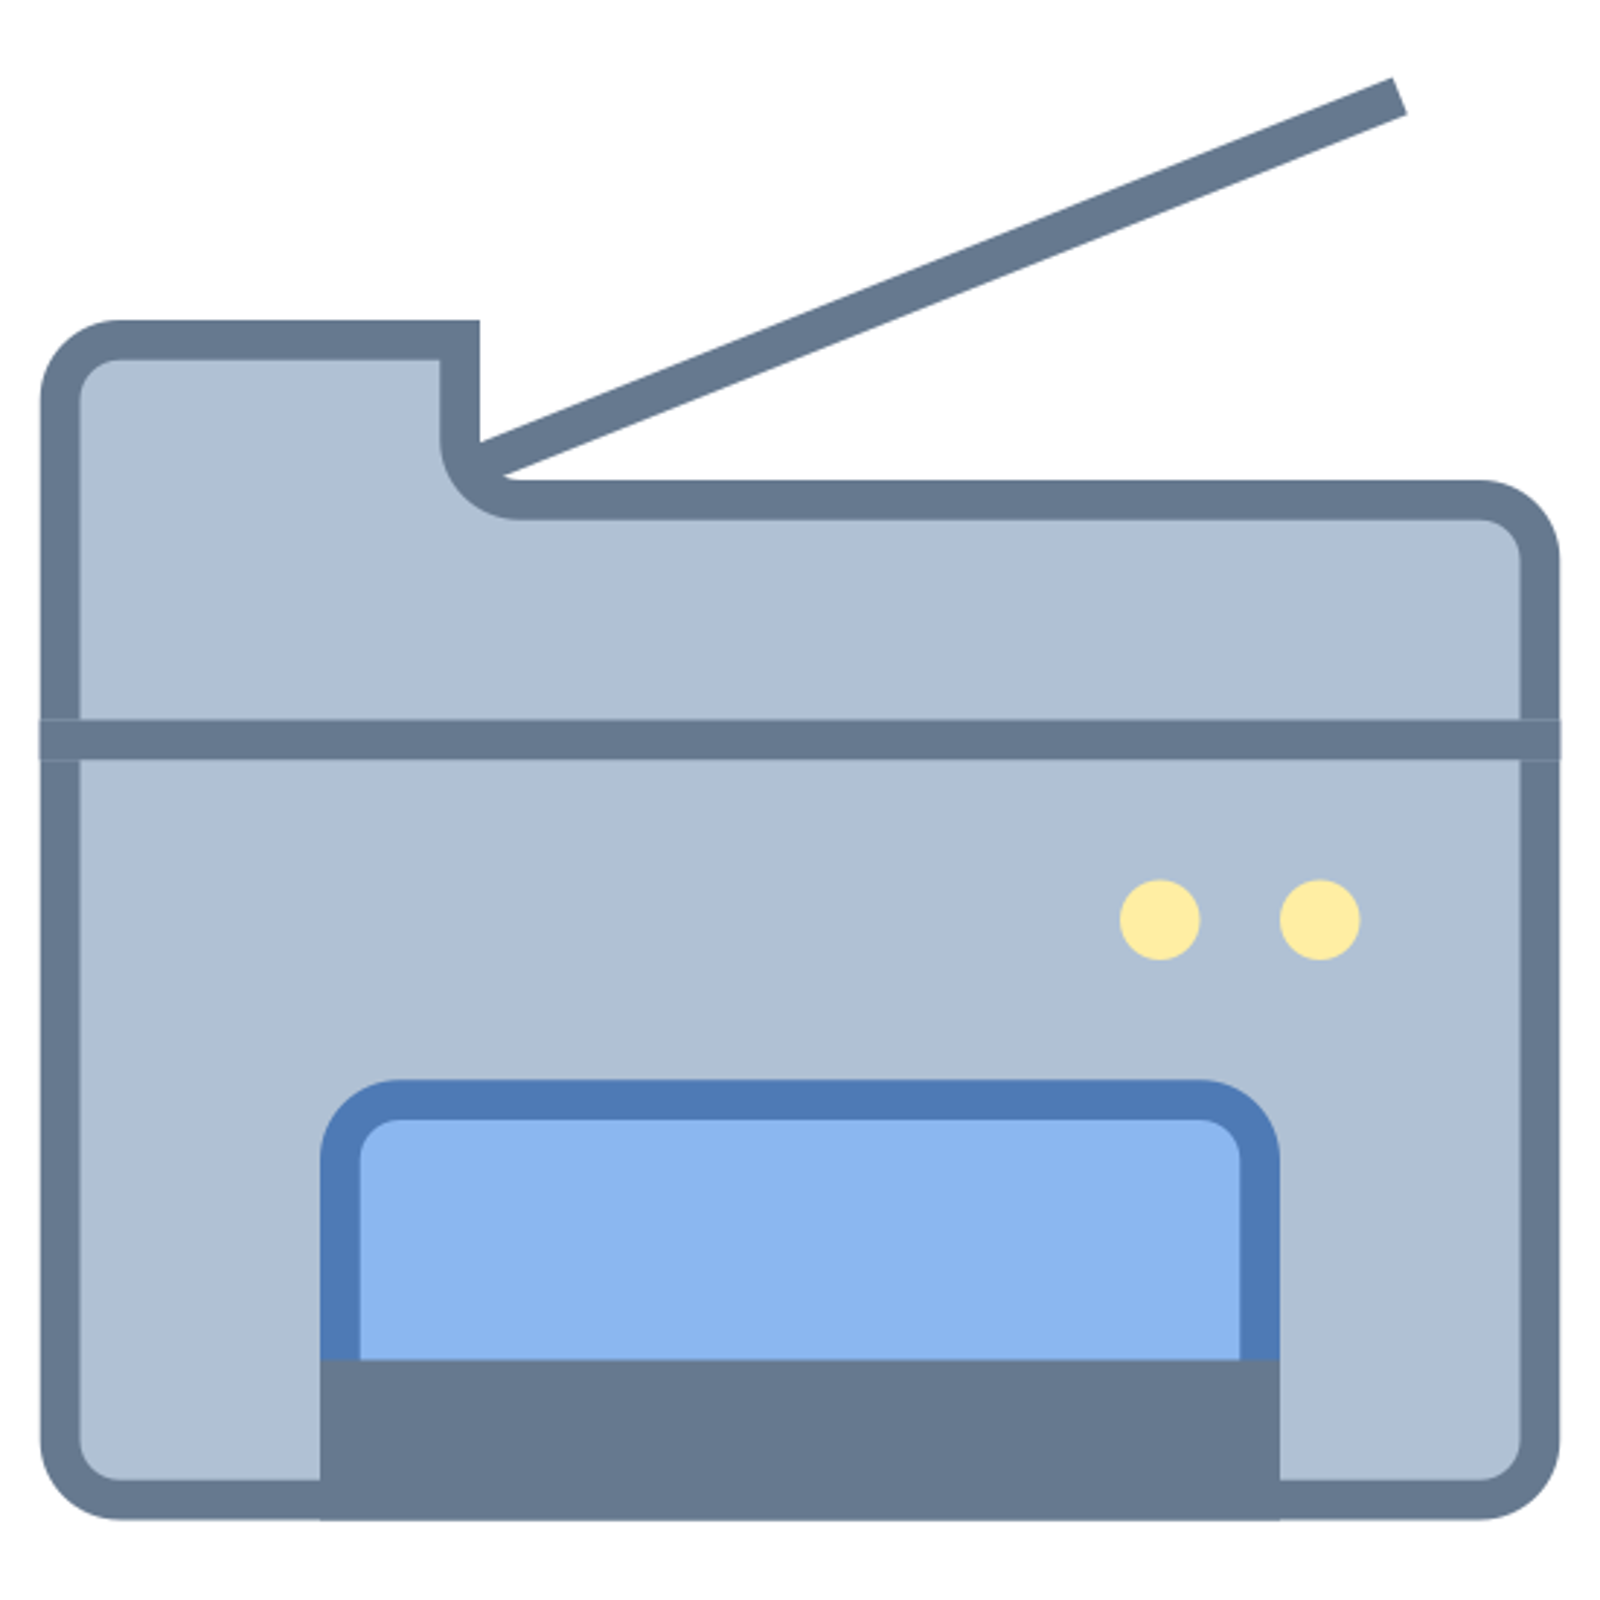 Kserokopiarka icon